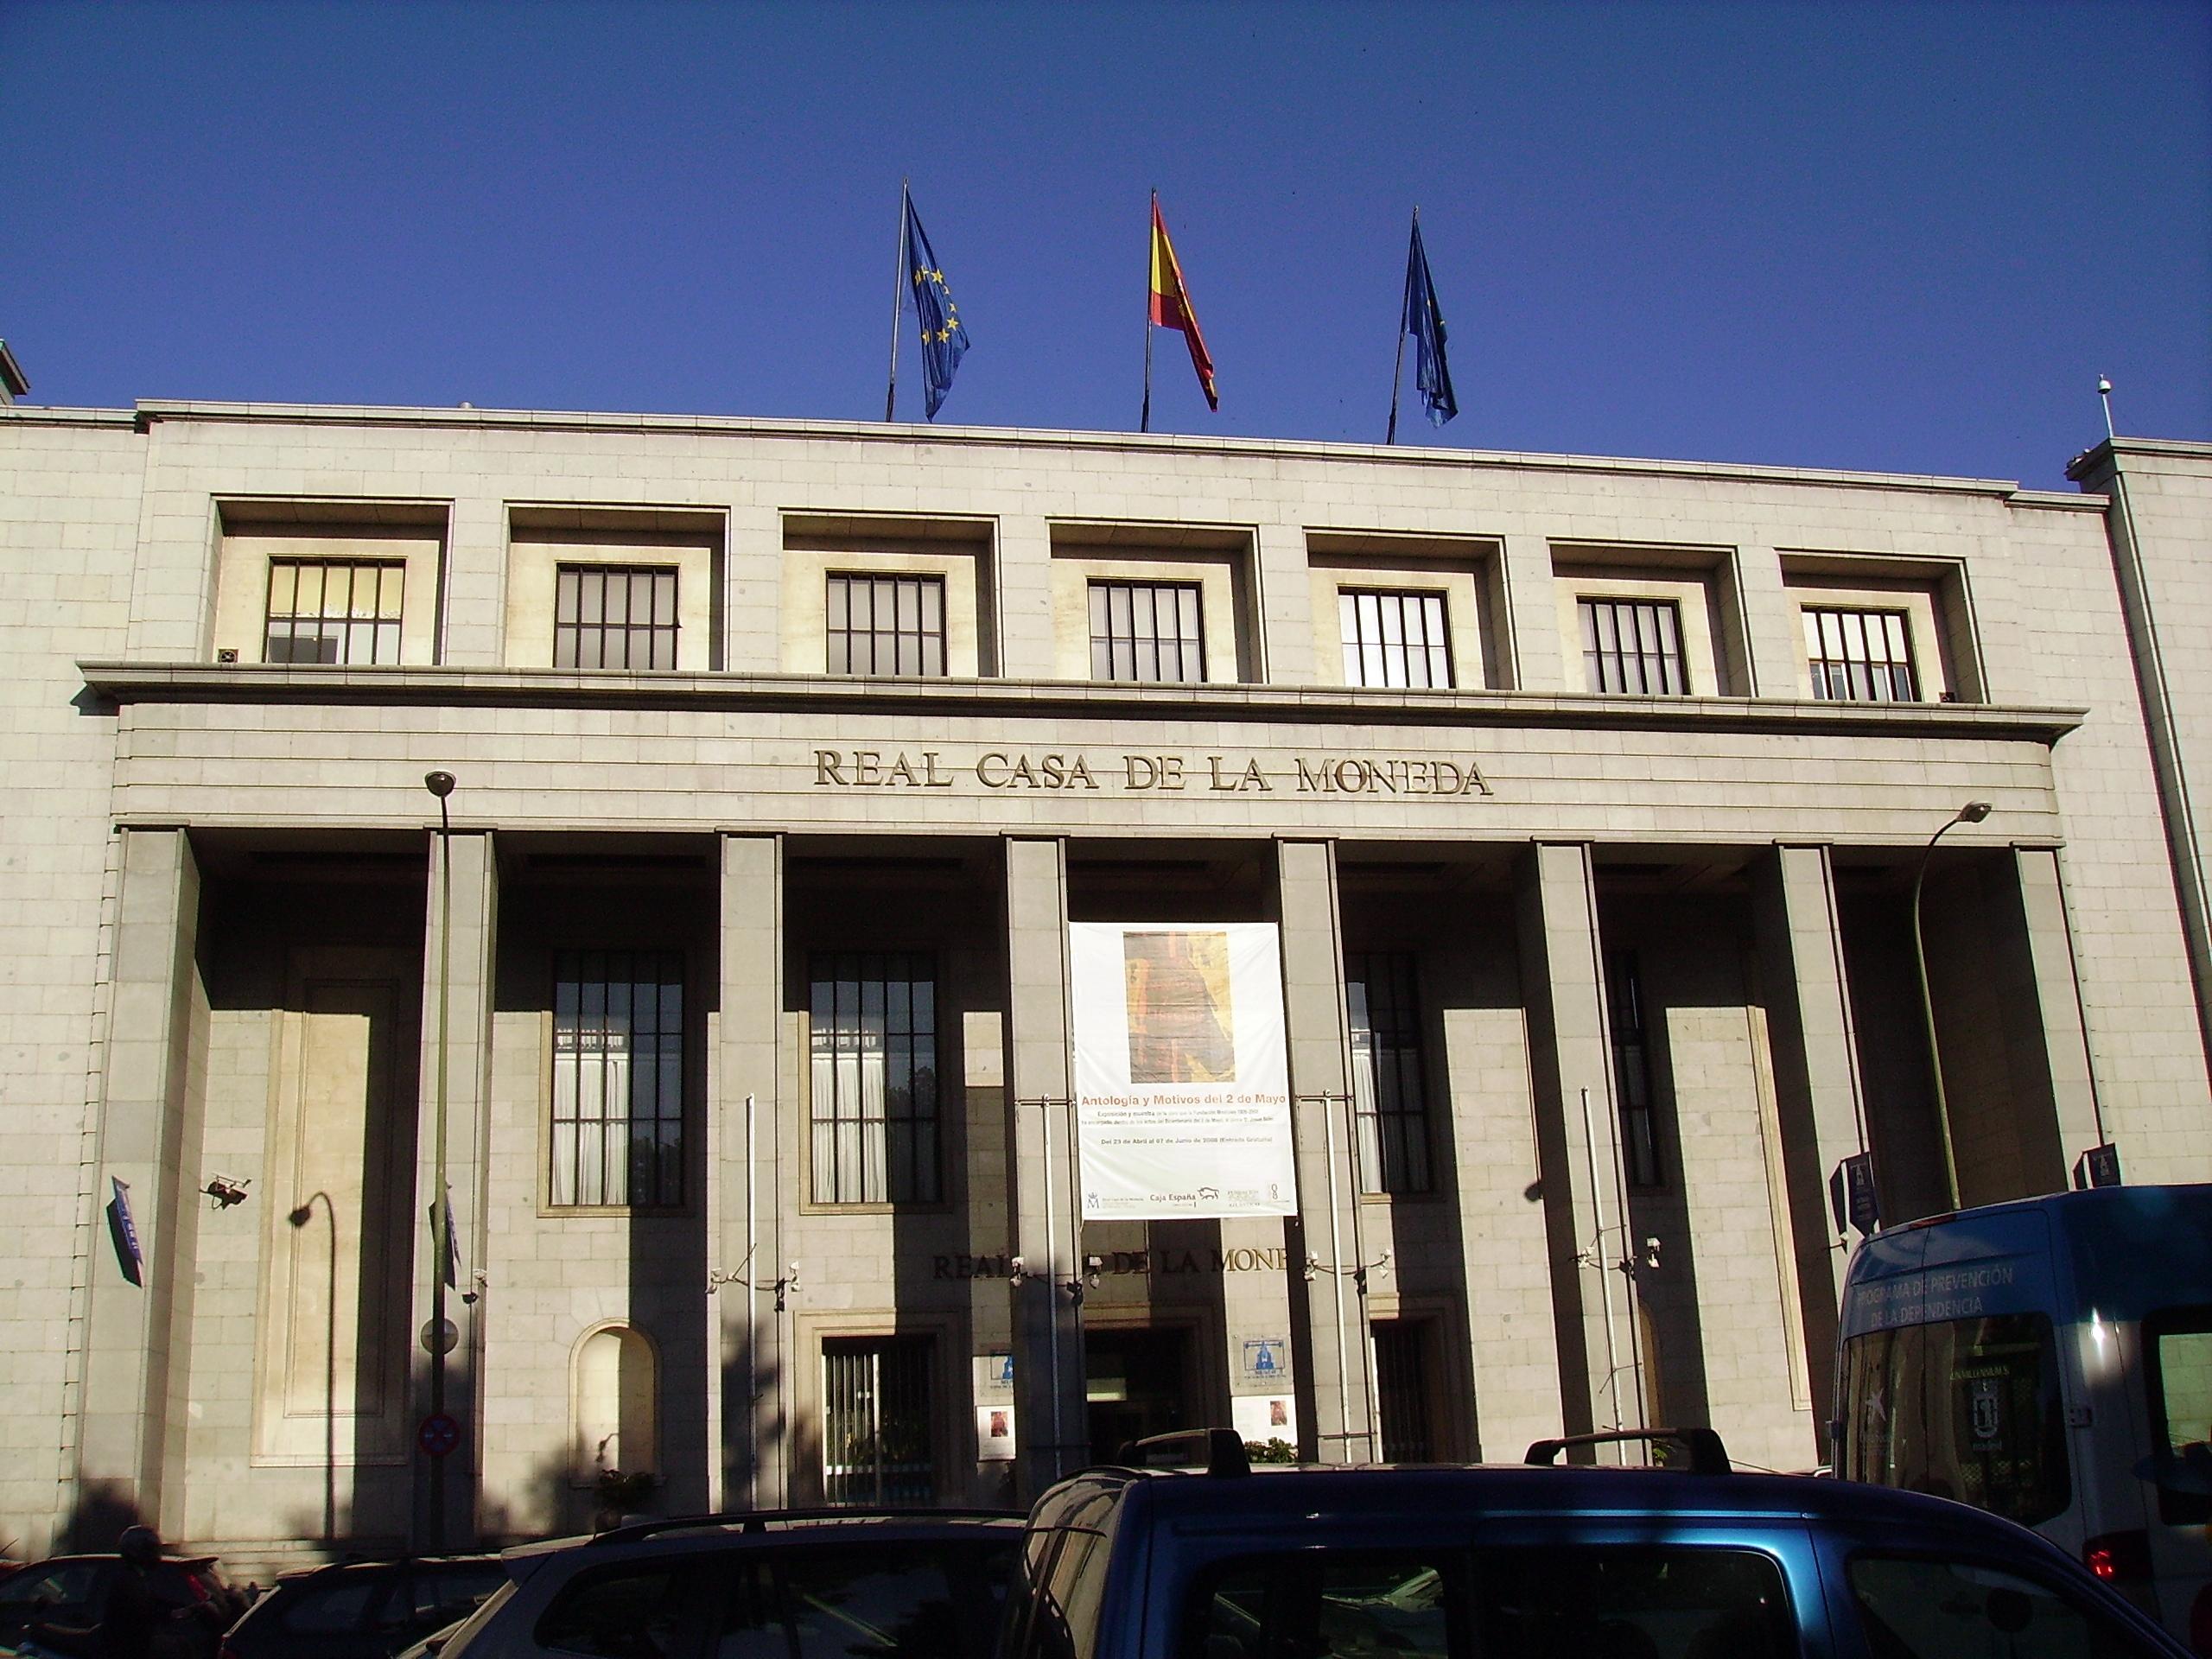 File real casa de la moneda fabrica nacional de moneda y timbre wikimedia commons - Timbre de casa ...